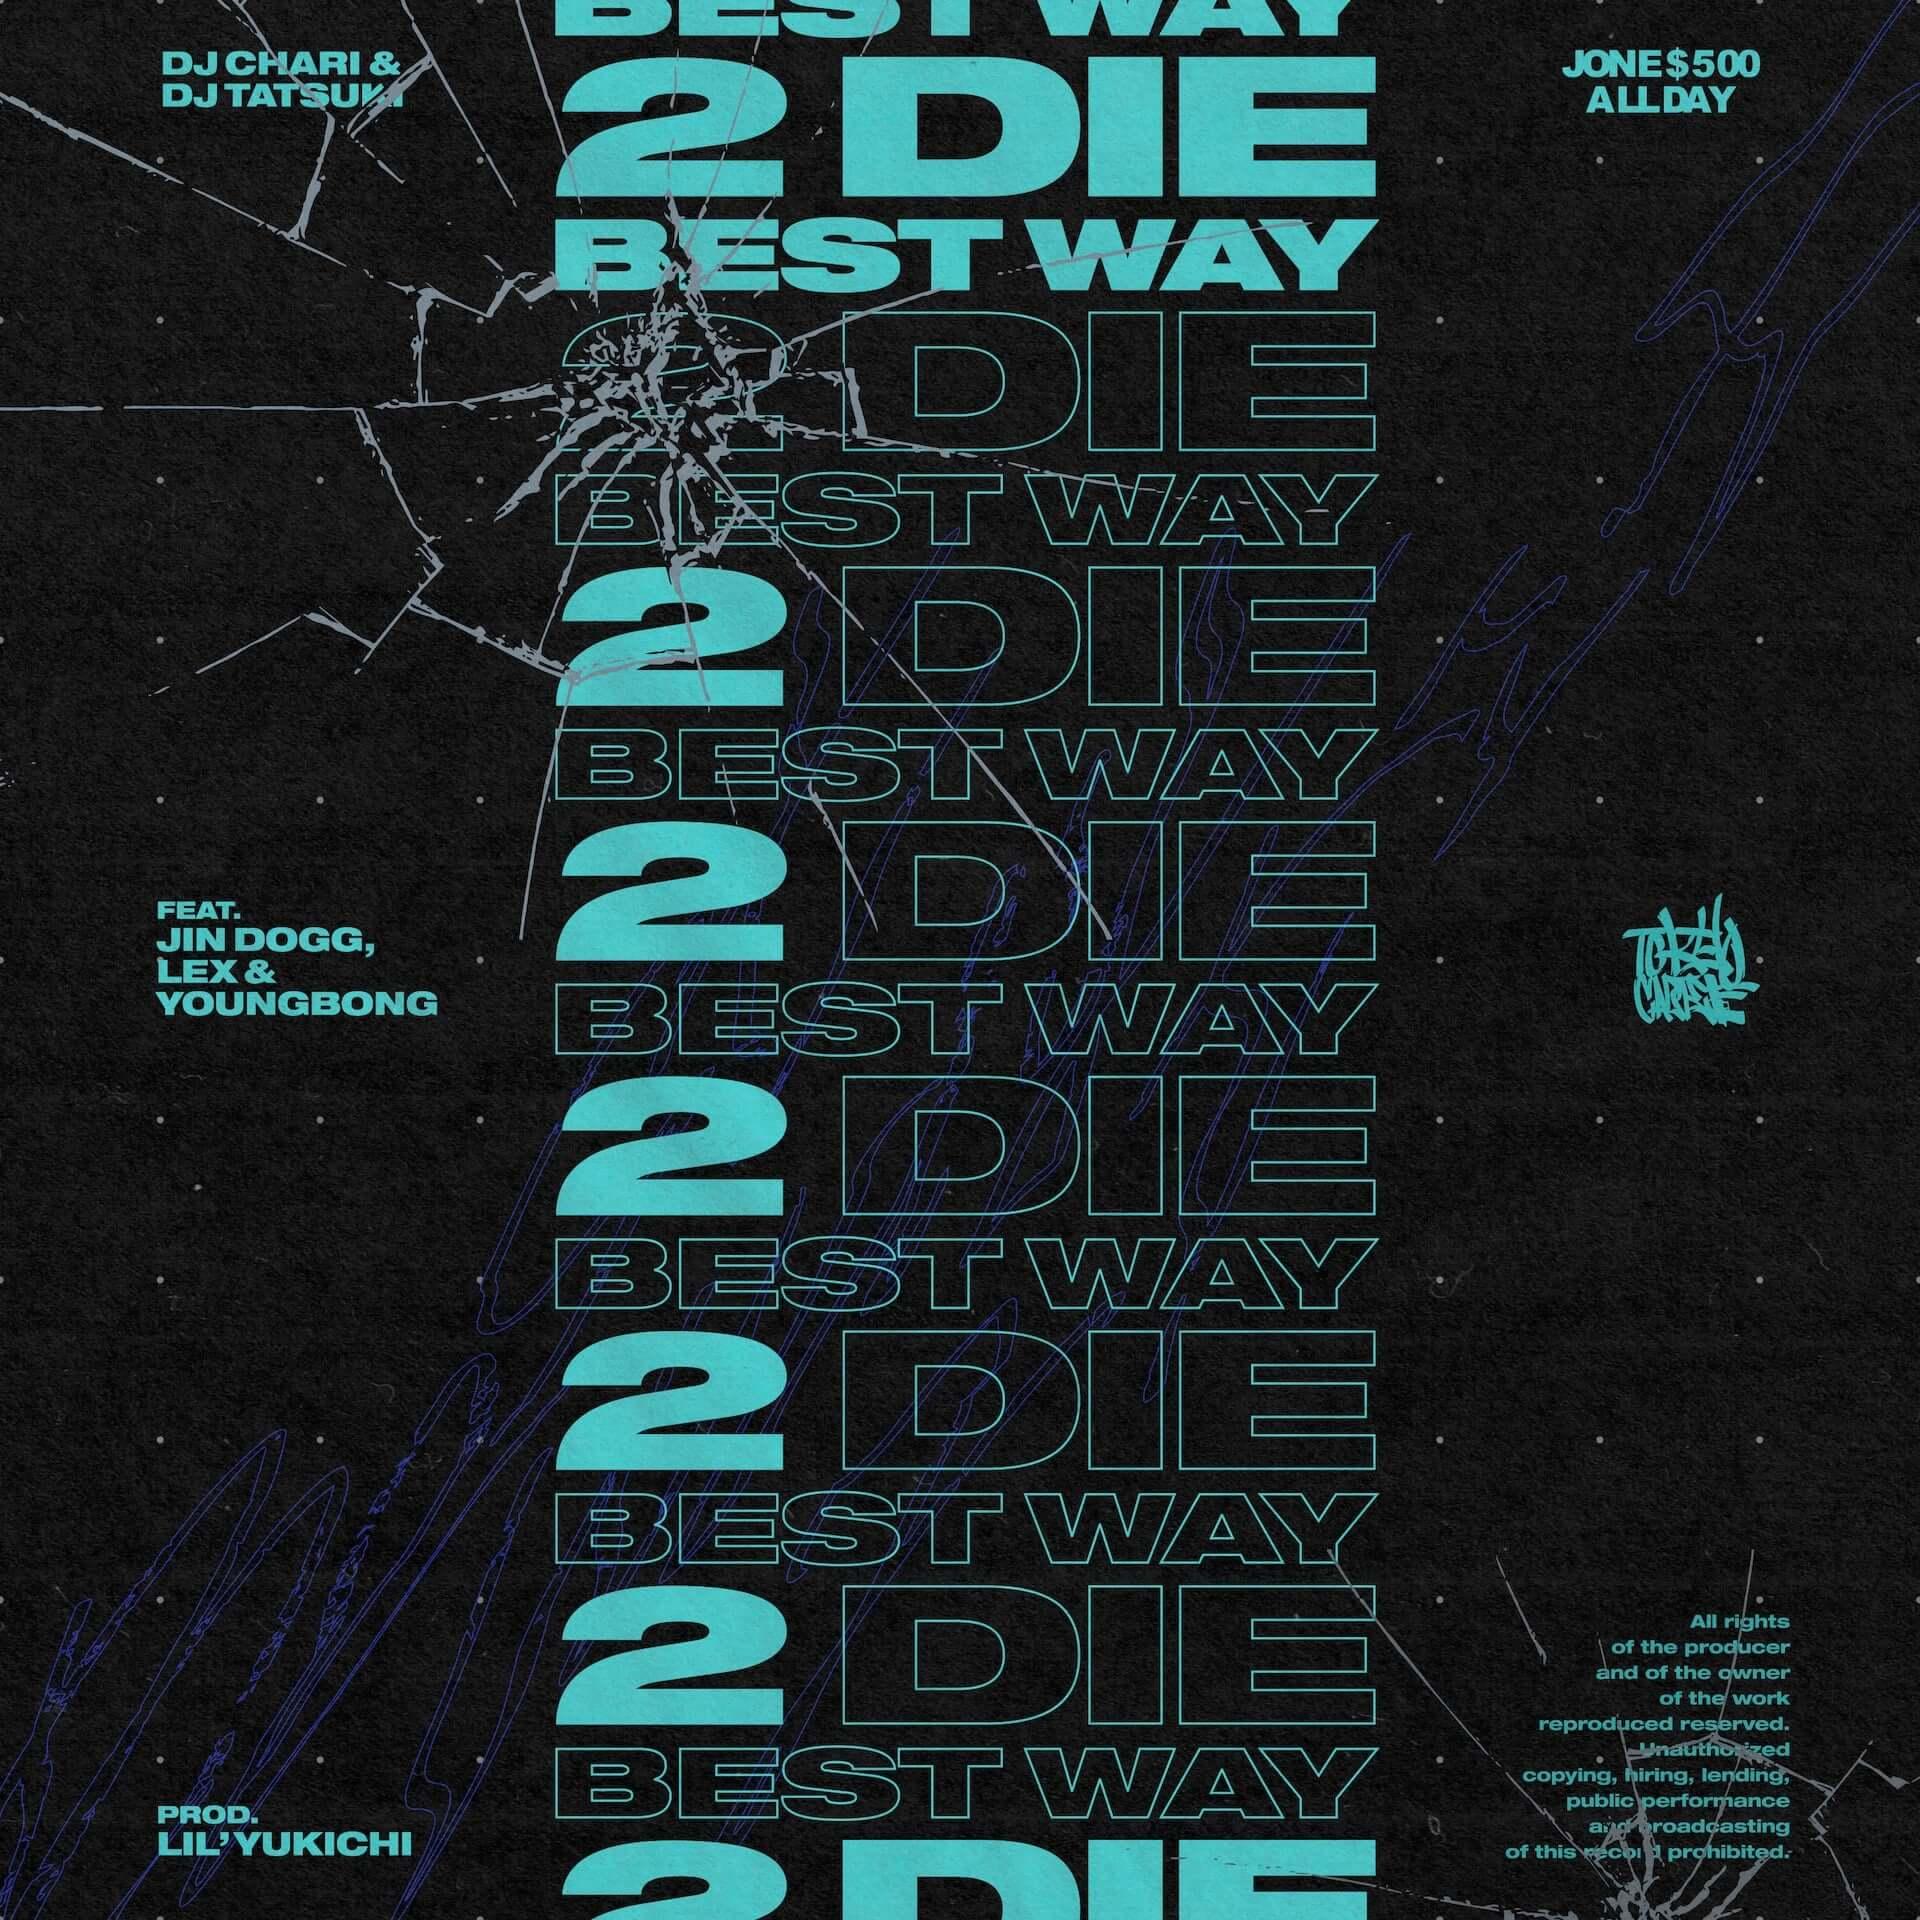 "DJ CHARI & DJ TATSUKIがJin Dogg、LEX、YOUNGBONを迎えた新曲""Best Way 2 Die""のMVを公開!ディレクターはNasty Men$ah music200818_bestway2die-mv_2-1920x1920"